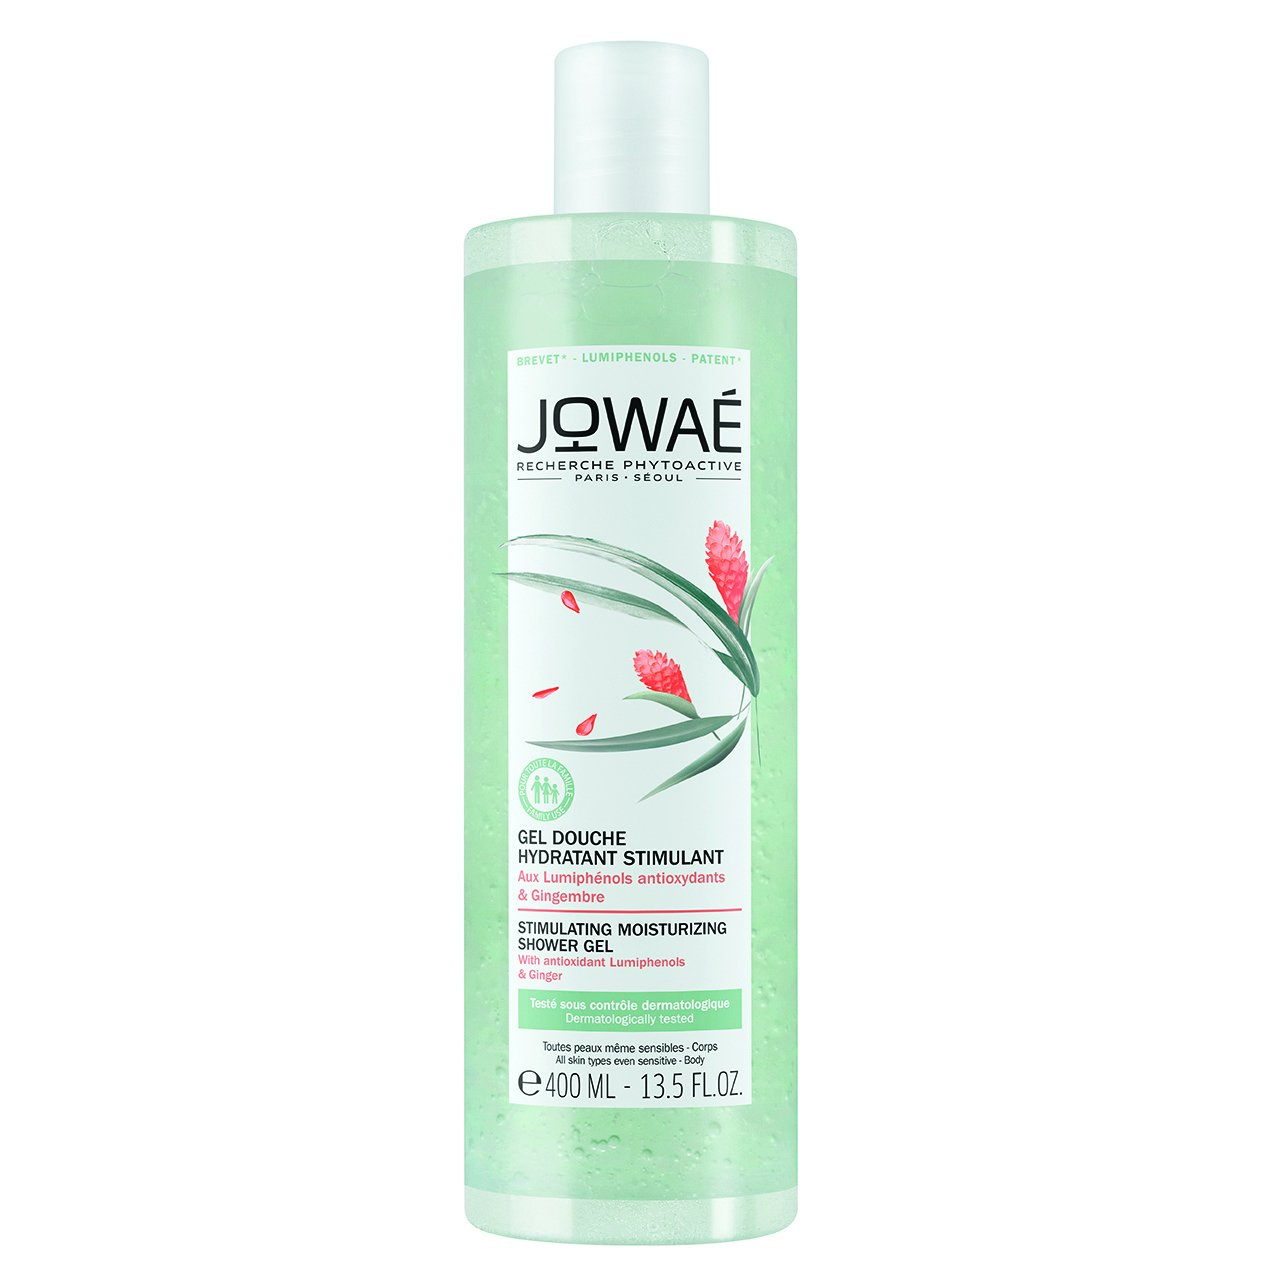 Jowae Stimulating Moisturizing Shower Gel Τονωτικό Ενυδατικό Αφρόλουτρο με Αντιοξειδωτικές Φωτοφαινόλες & Ginger 400ml